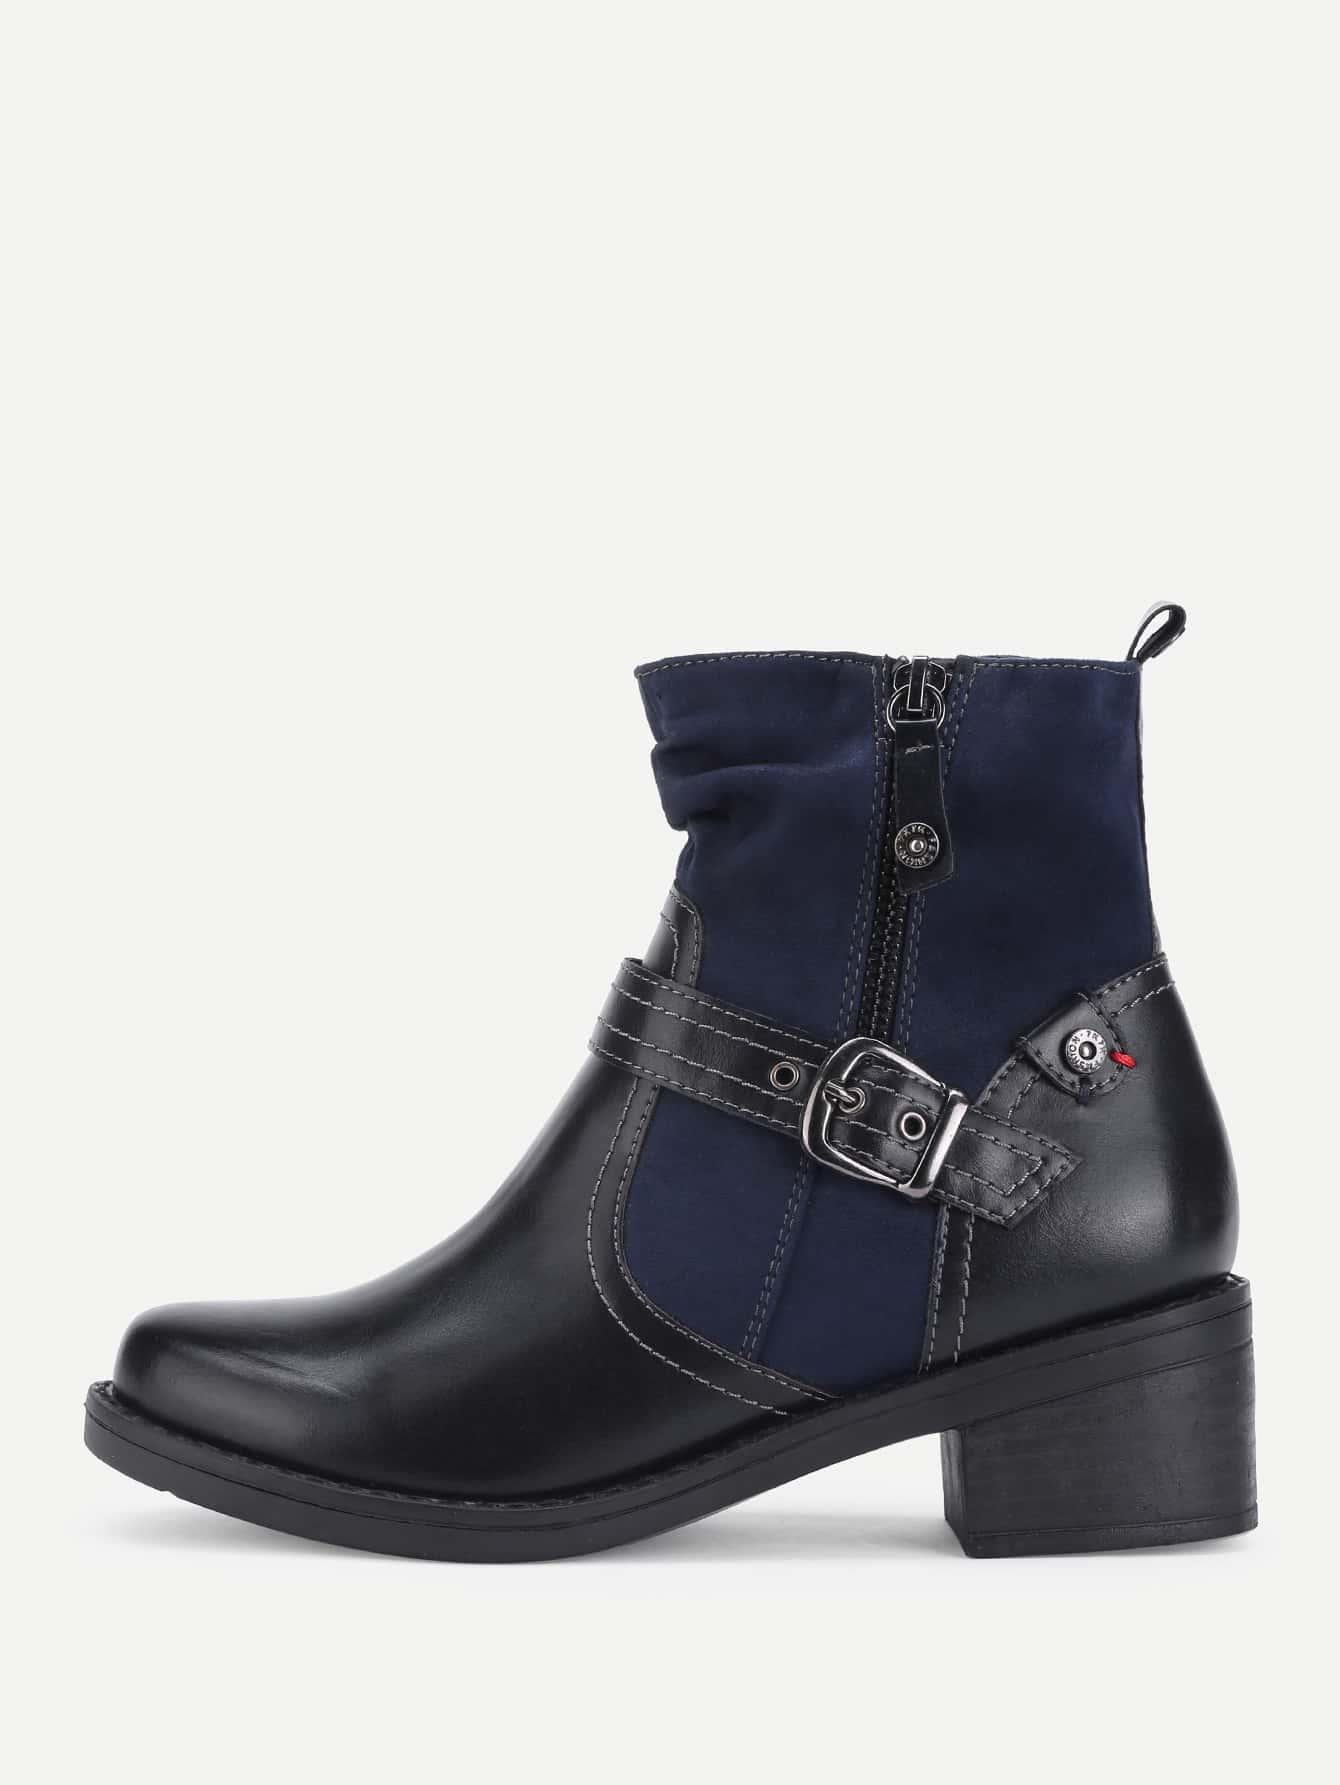 Side Zipper Block Heeled Ankle Boots inew телефон в воронеже где